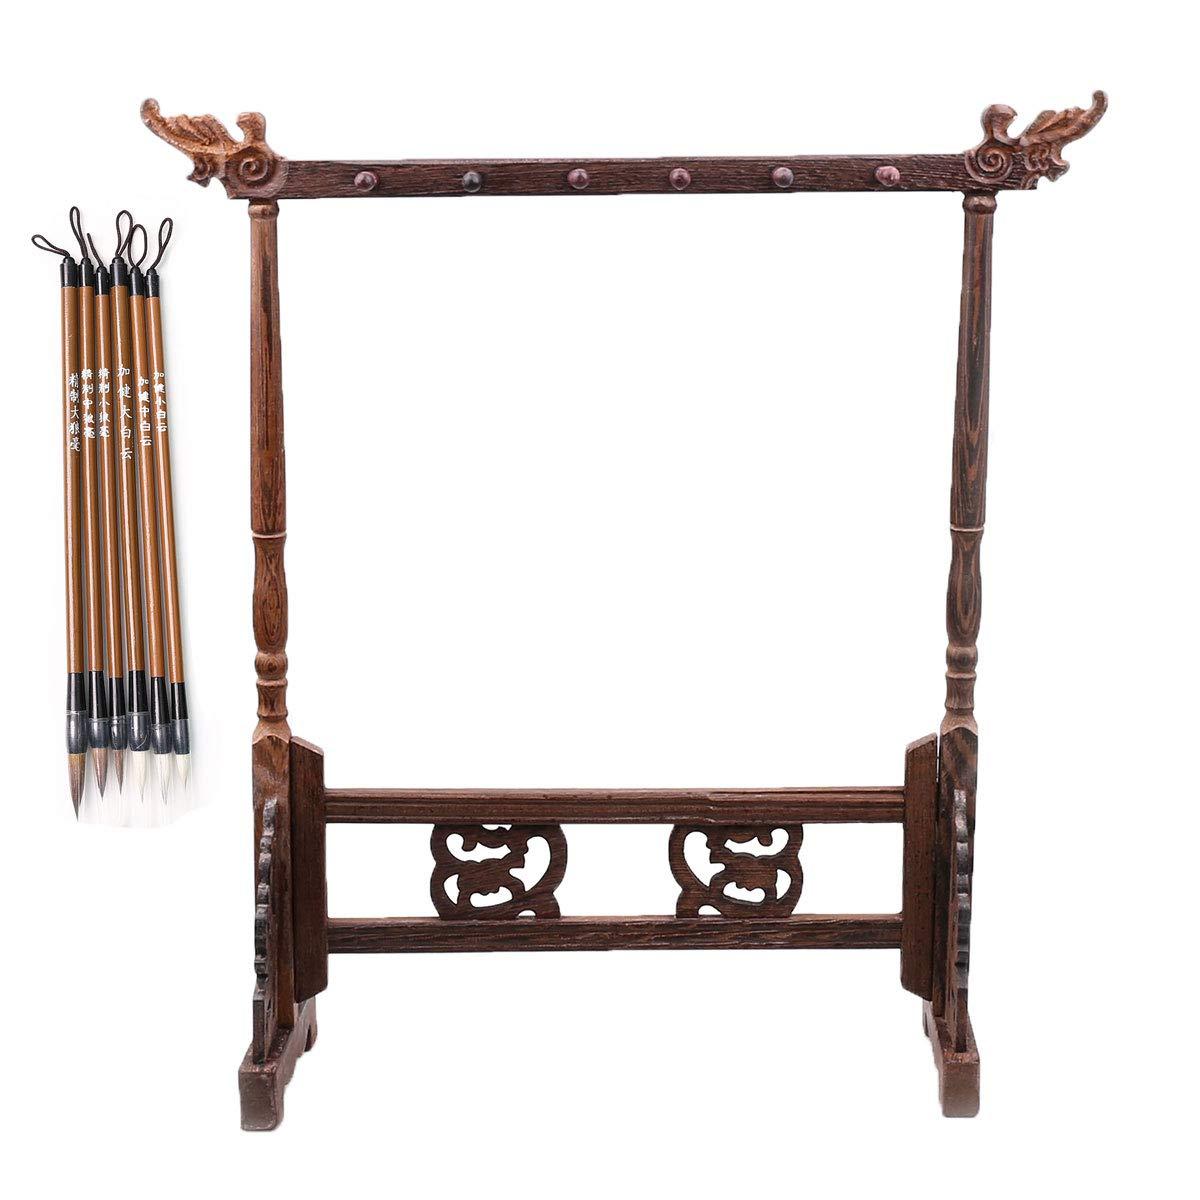 Father's Day Gift,12-pin wenge Brush Holder/Wood Penholder Pen Hanging/Calligraphy / Rosewood 12 Pin Calligraphy Sumi Drawing Kanji Brush Pen Hanger by Qiaoya